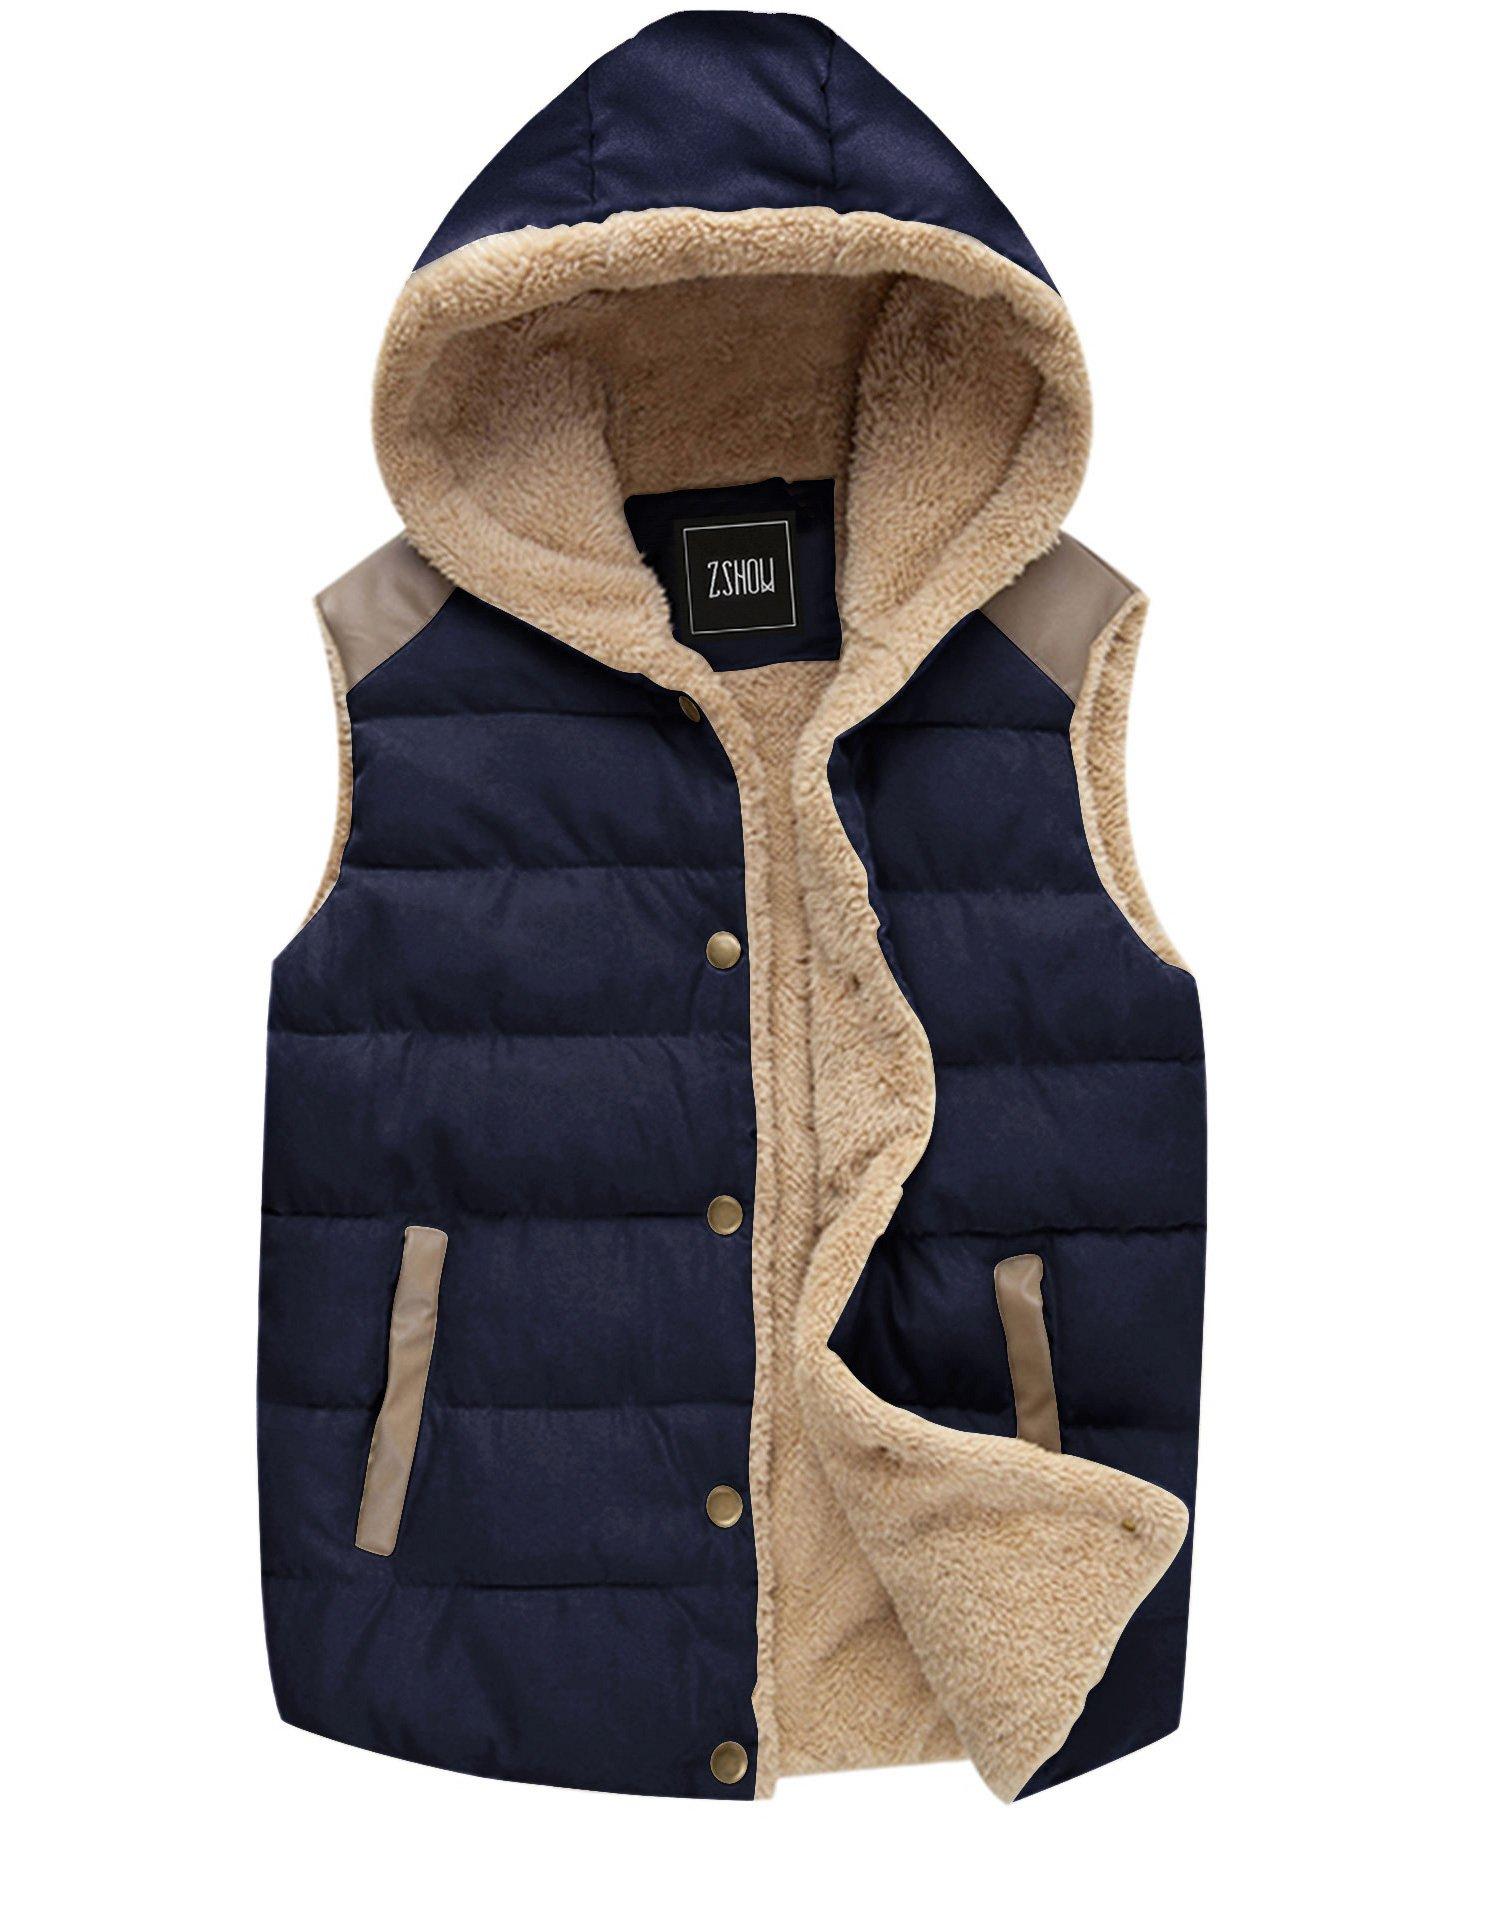 ZSHOW Women's Lightweight Warm Padded Hooded Vest,US-M,Dark Blue by ZSHOW